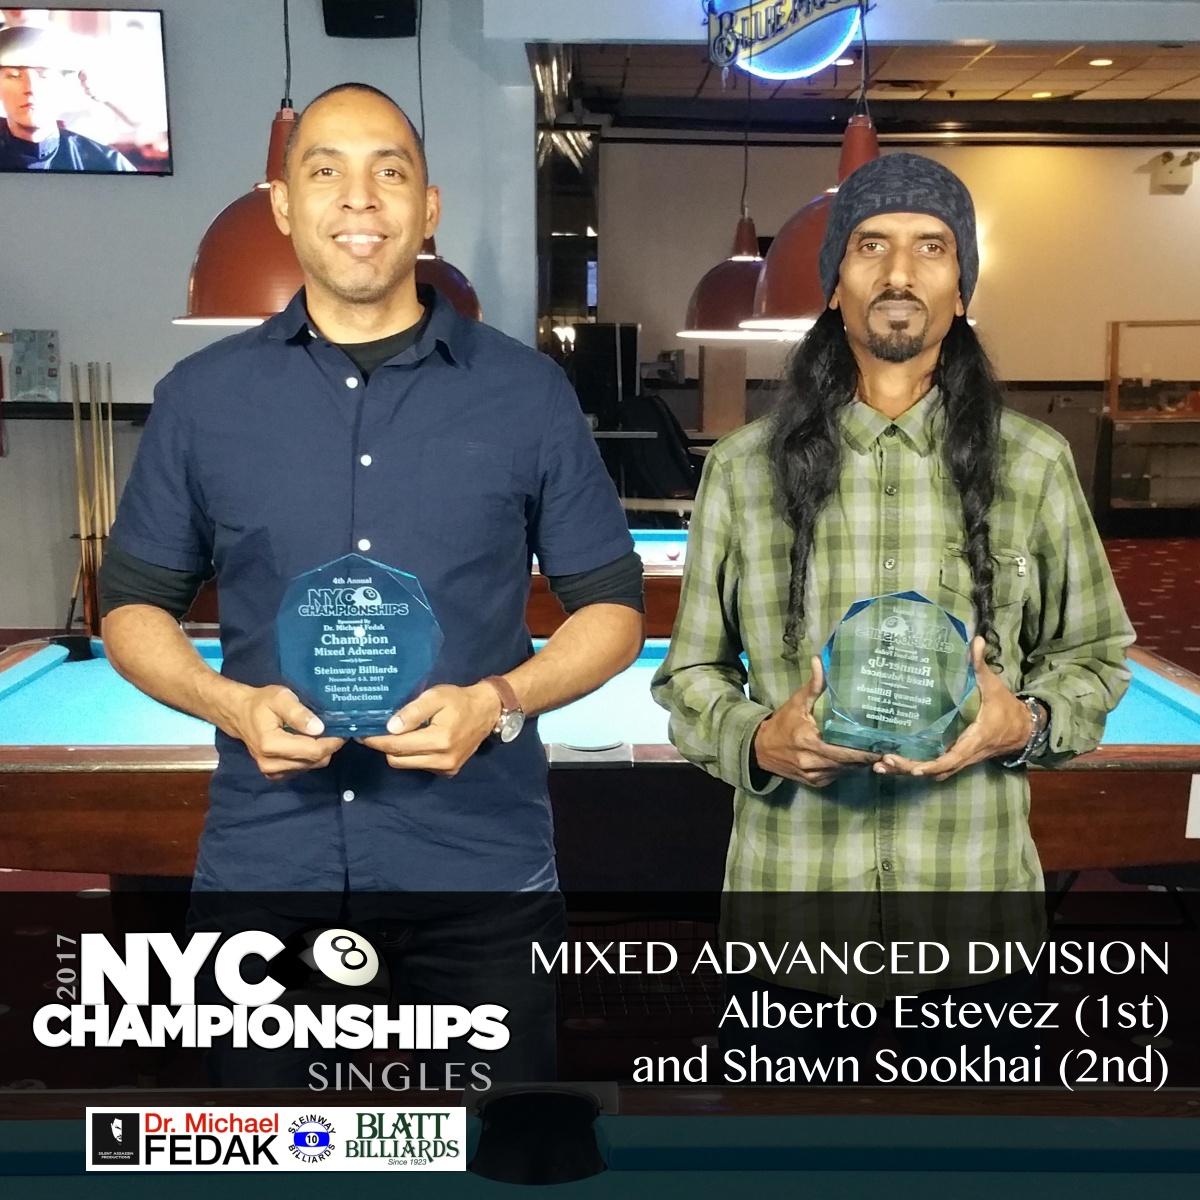 Mixed Advanced L-R 2nd Shawn Sookhai 1st Rick Miller